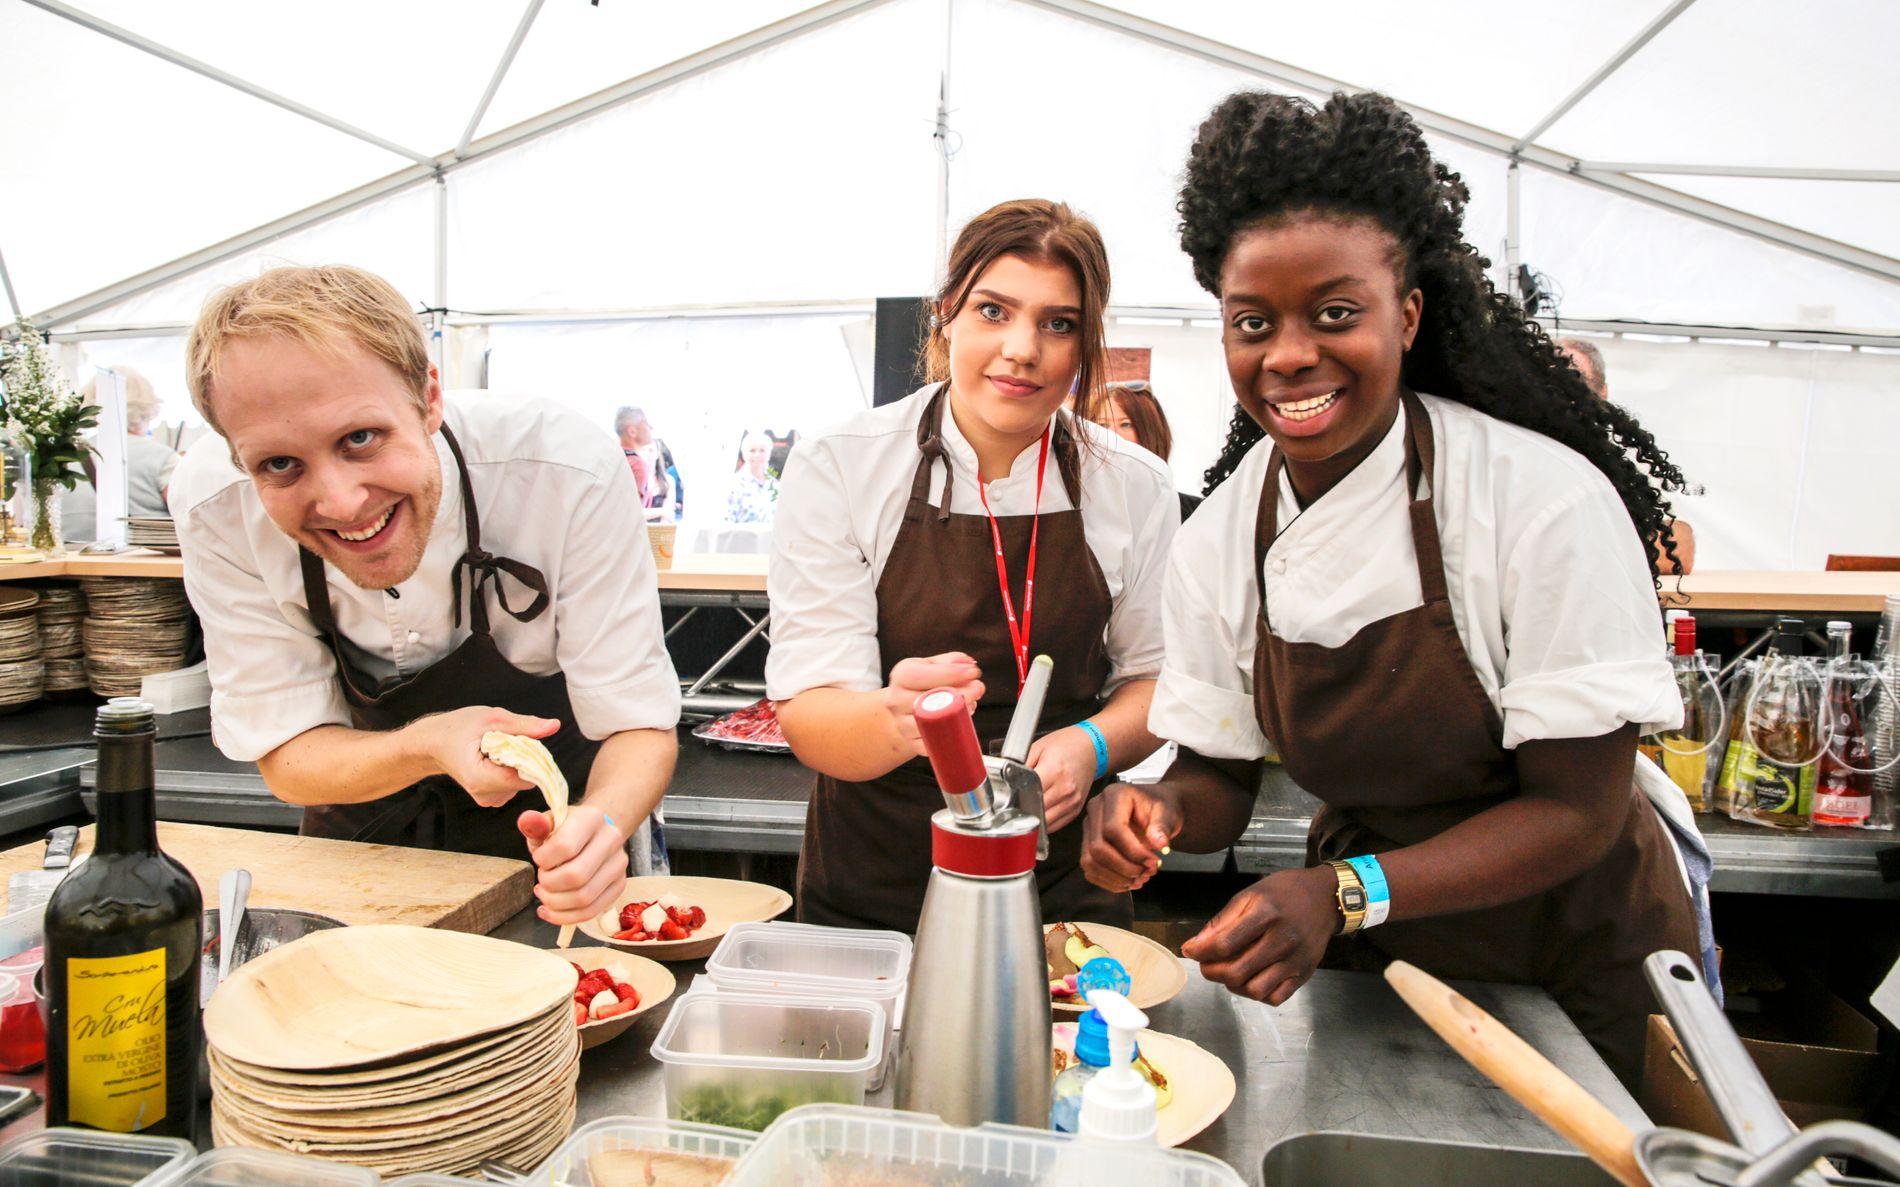 VELKOMMEN: Christer Økland, Julie Helgesen og Princess Dayo Wiliams (fra v.) var blant dem som bød på delikate retter på fjorårets matfestival.